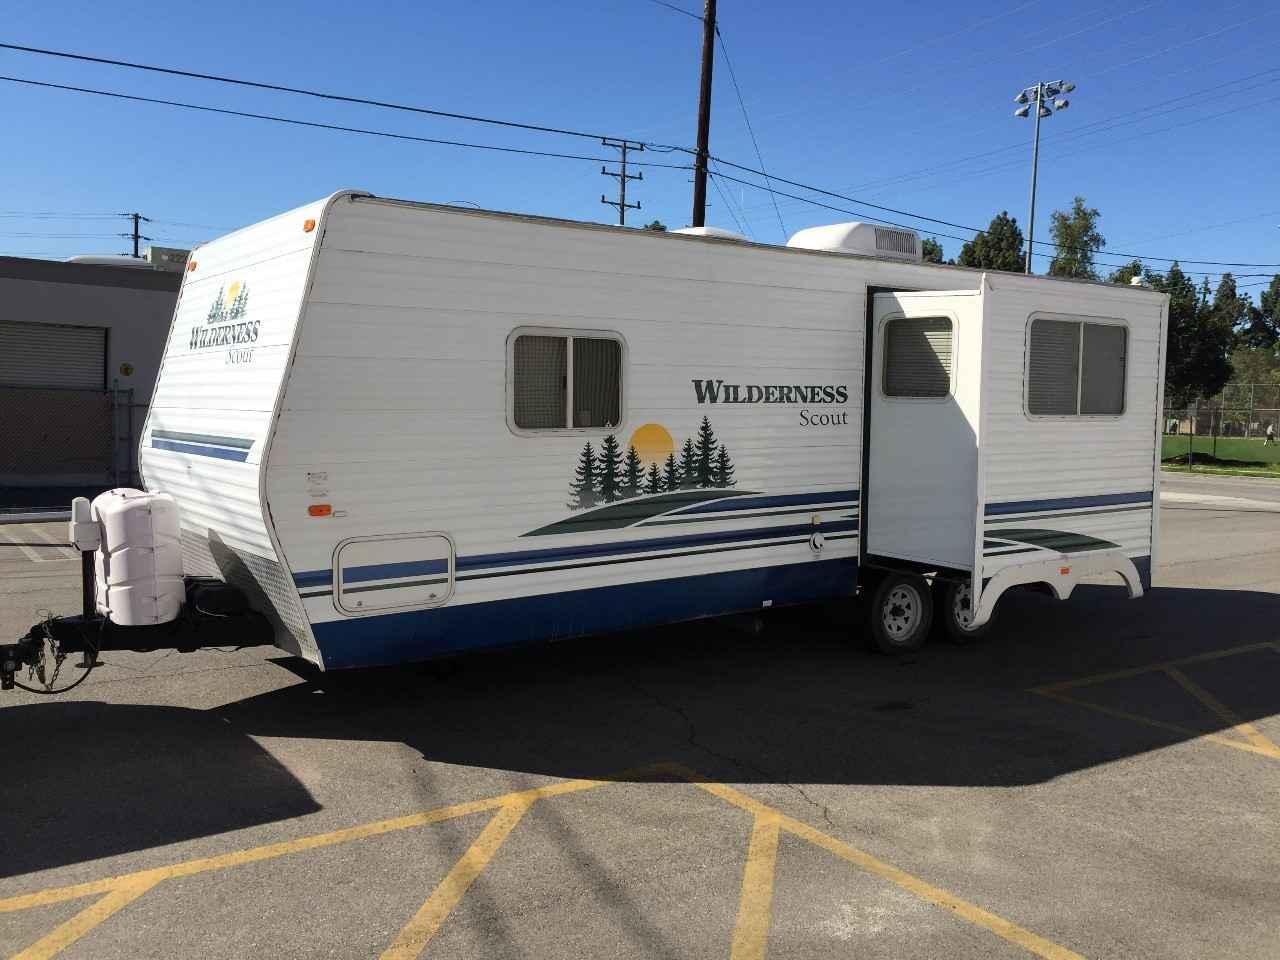 Wilderness Scout Travel Trailer